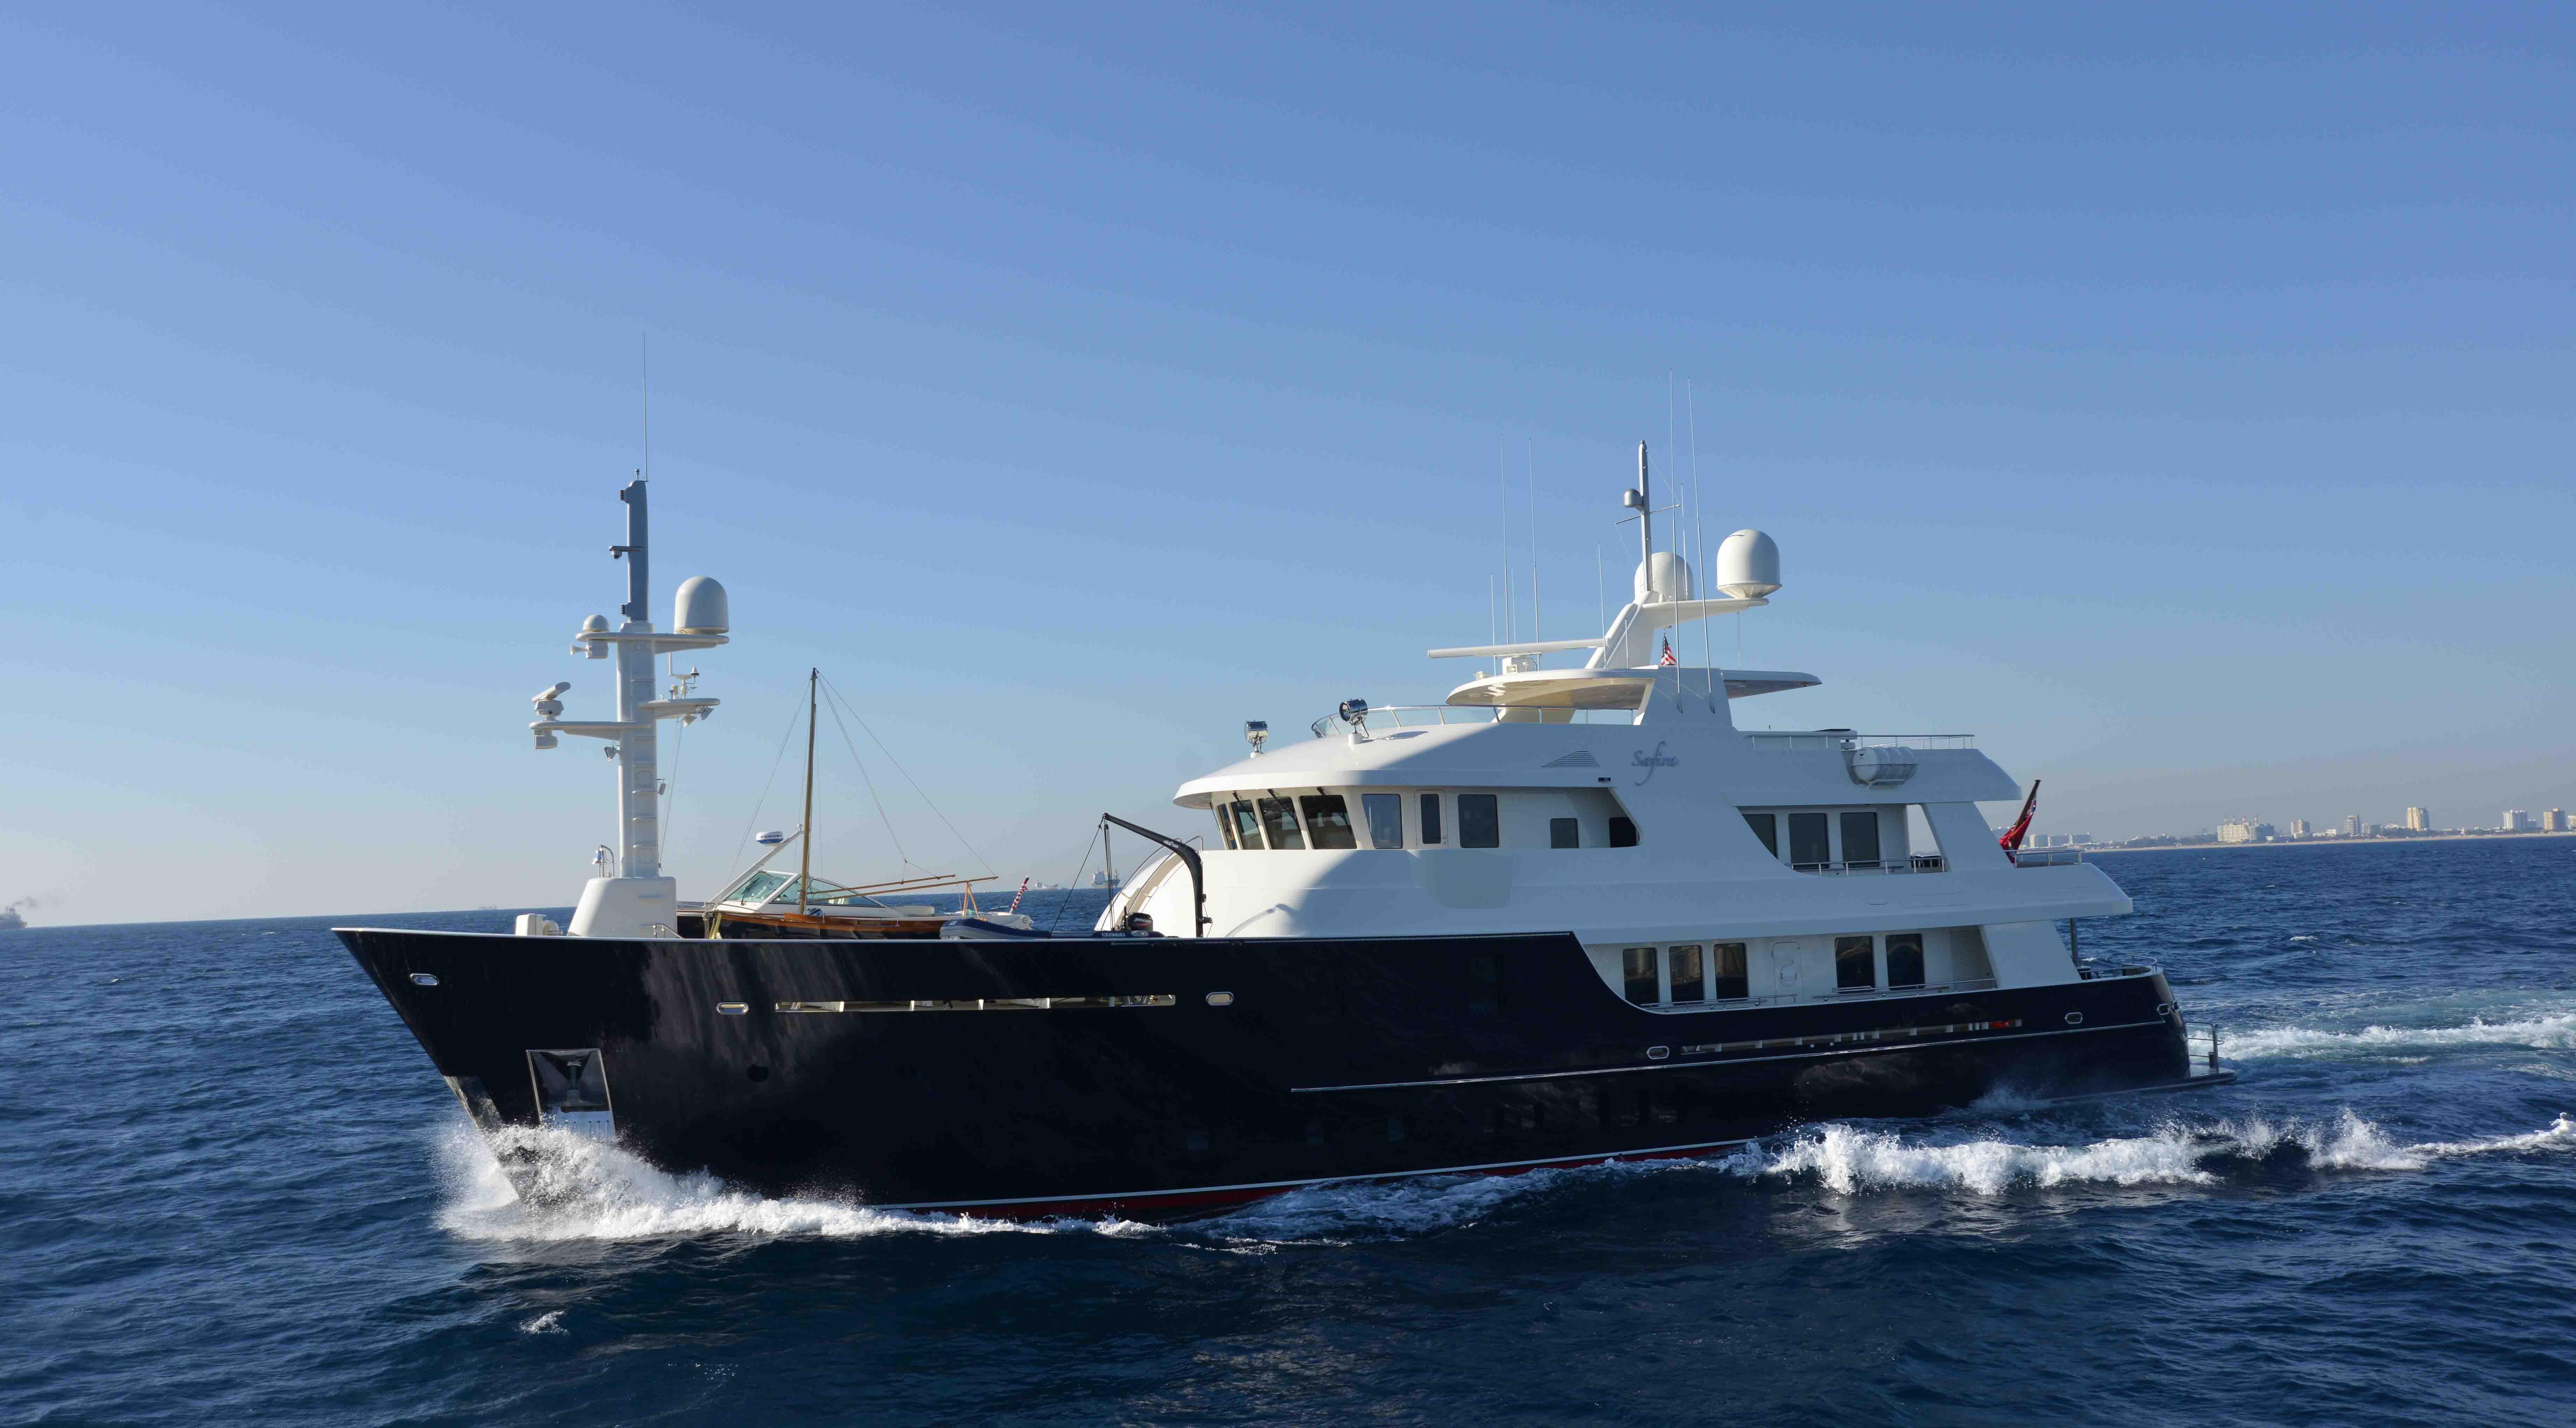 Motor Yacht Safira Cruising Yacht Charter Superyacht News